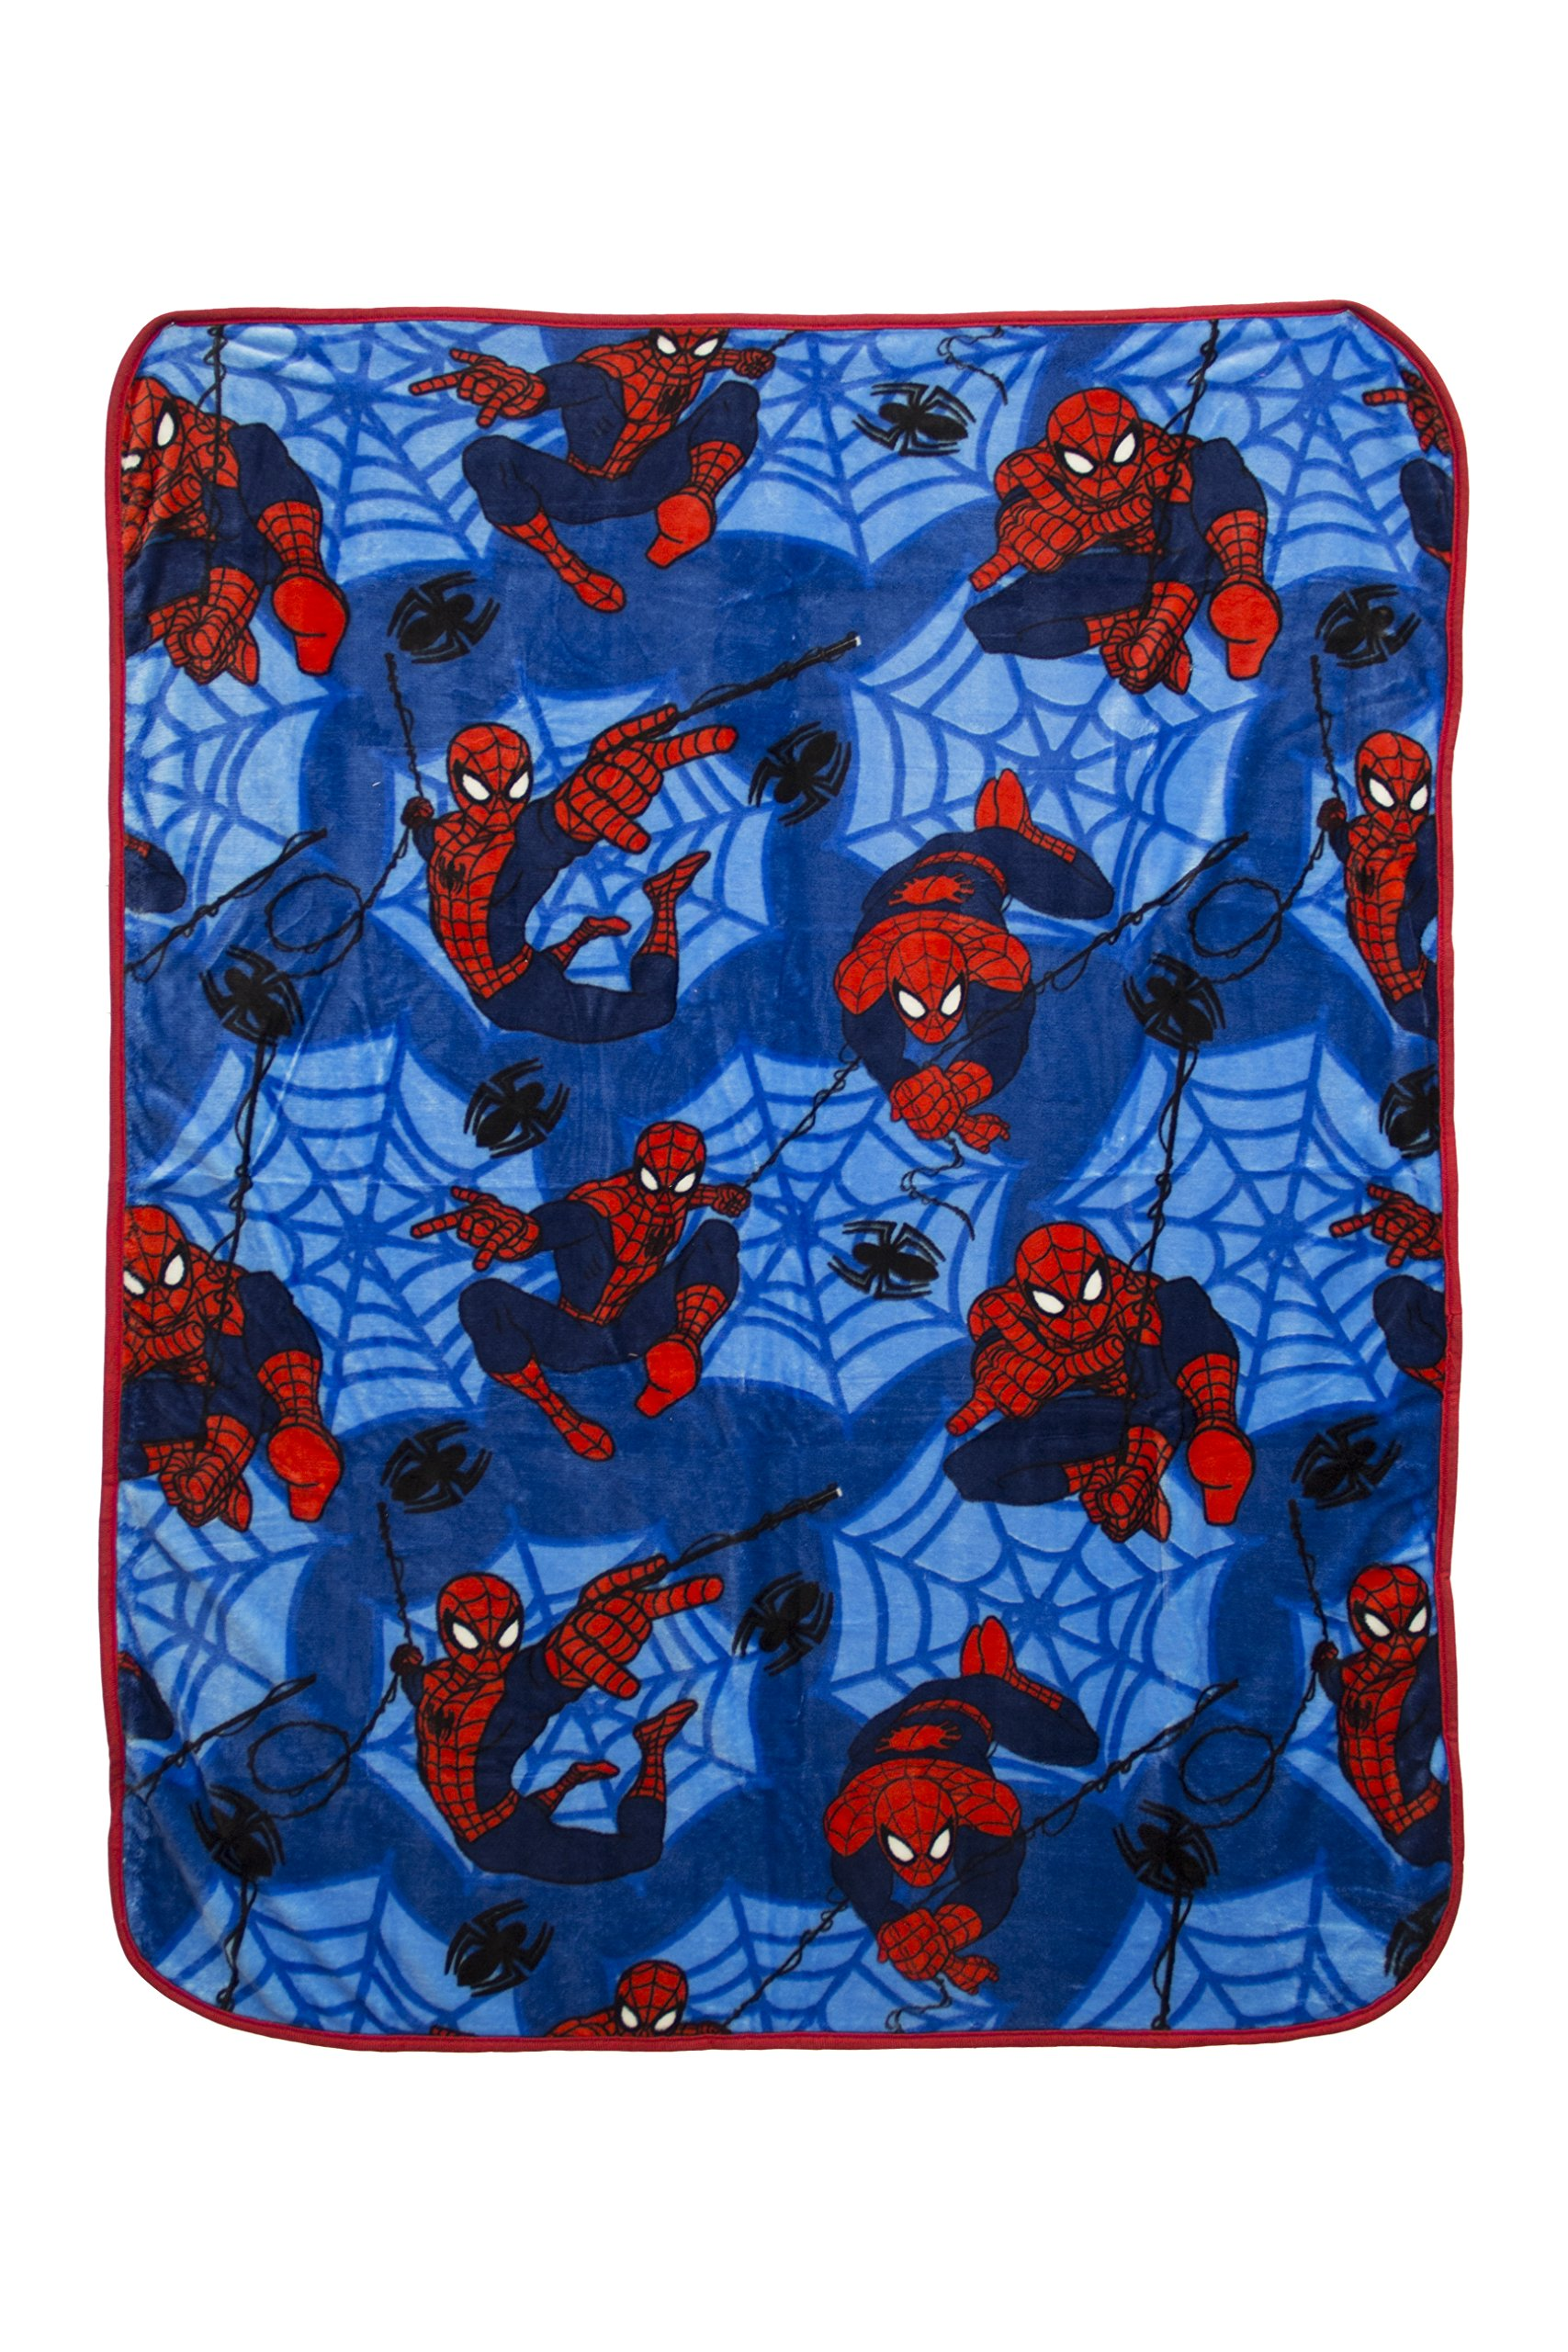 Marvel Spiderman Silk Touch Plush Throw